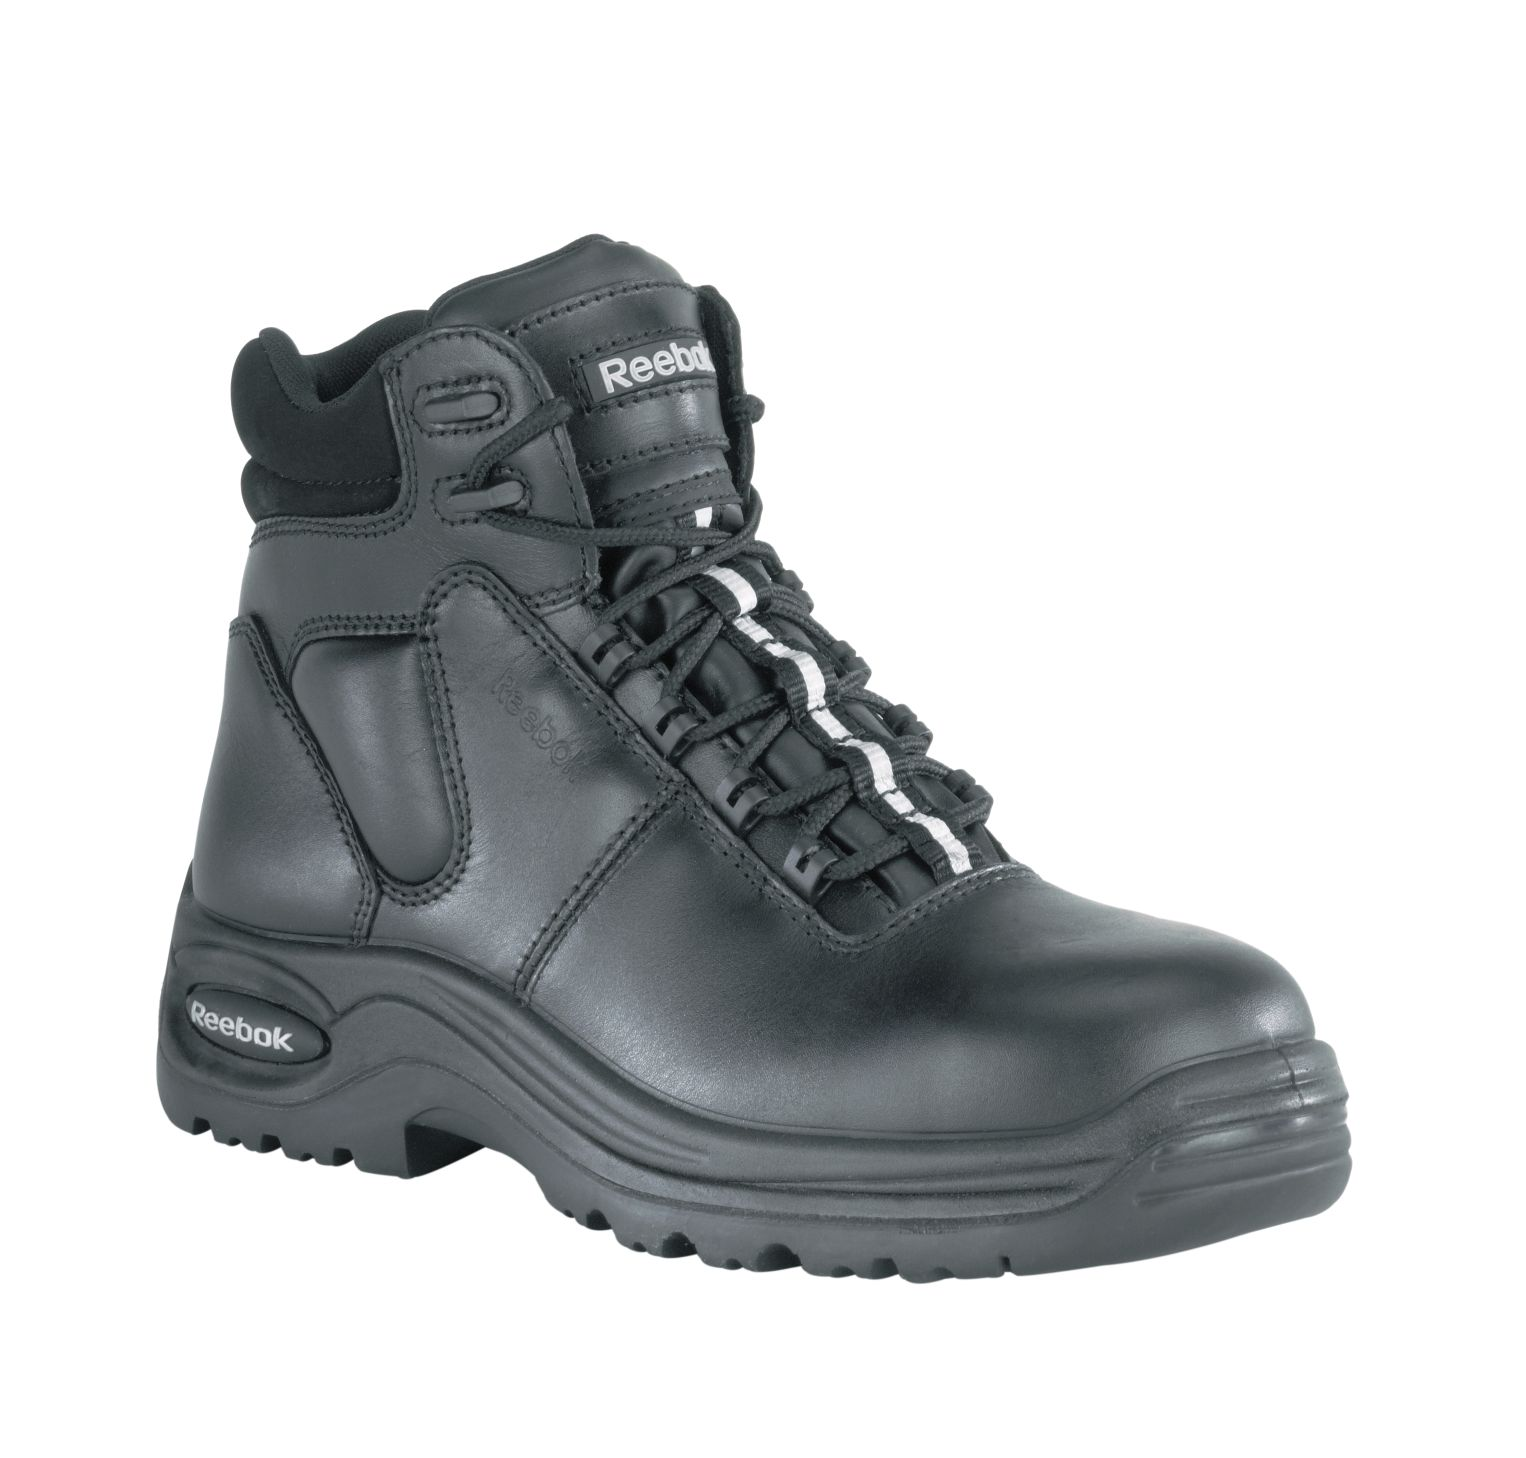 Reebok Rb6750 The Athlite Mens Size 13 Black